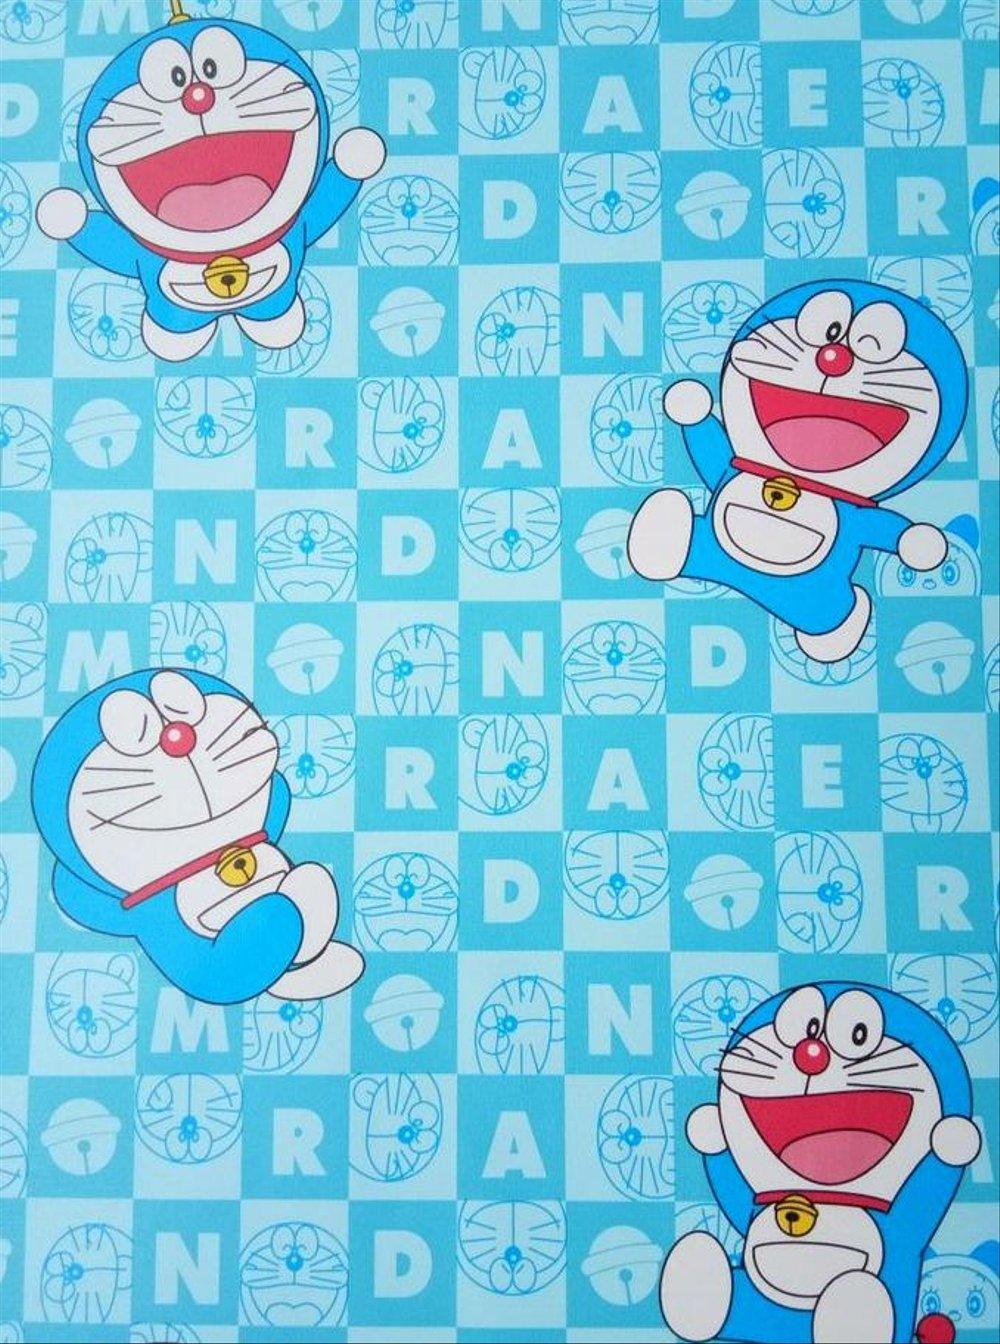 Doraemon Kotak 2374214 Hd Wallpaper Backgrounds Download